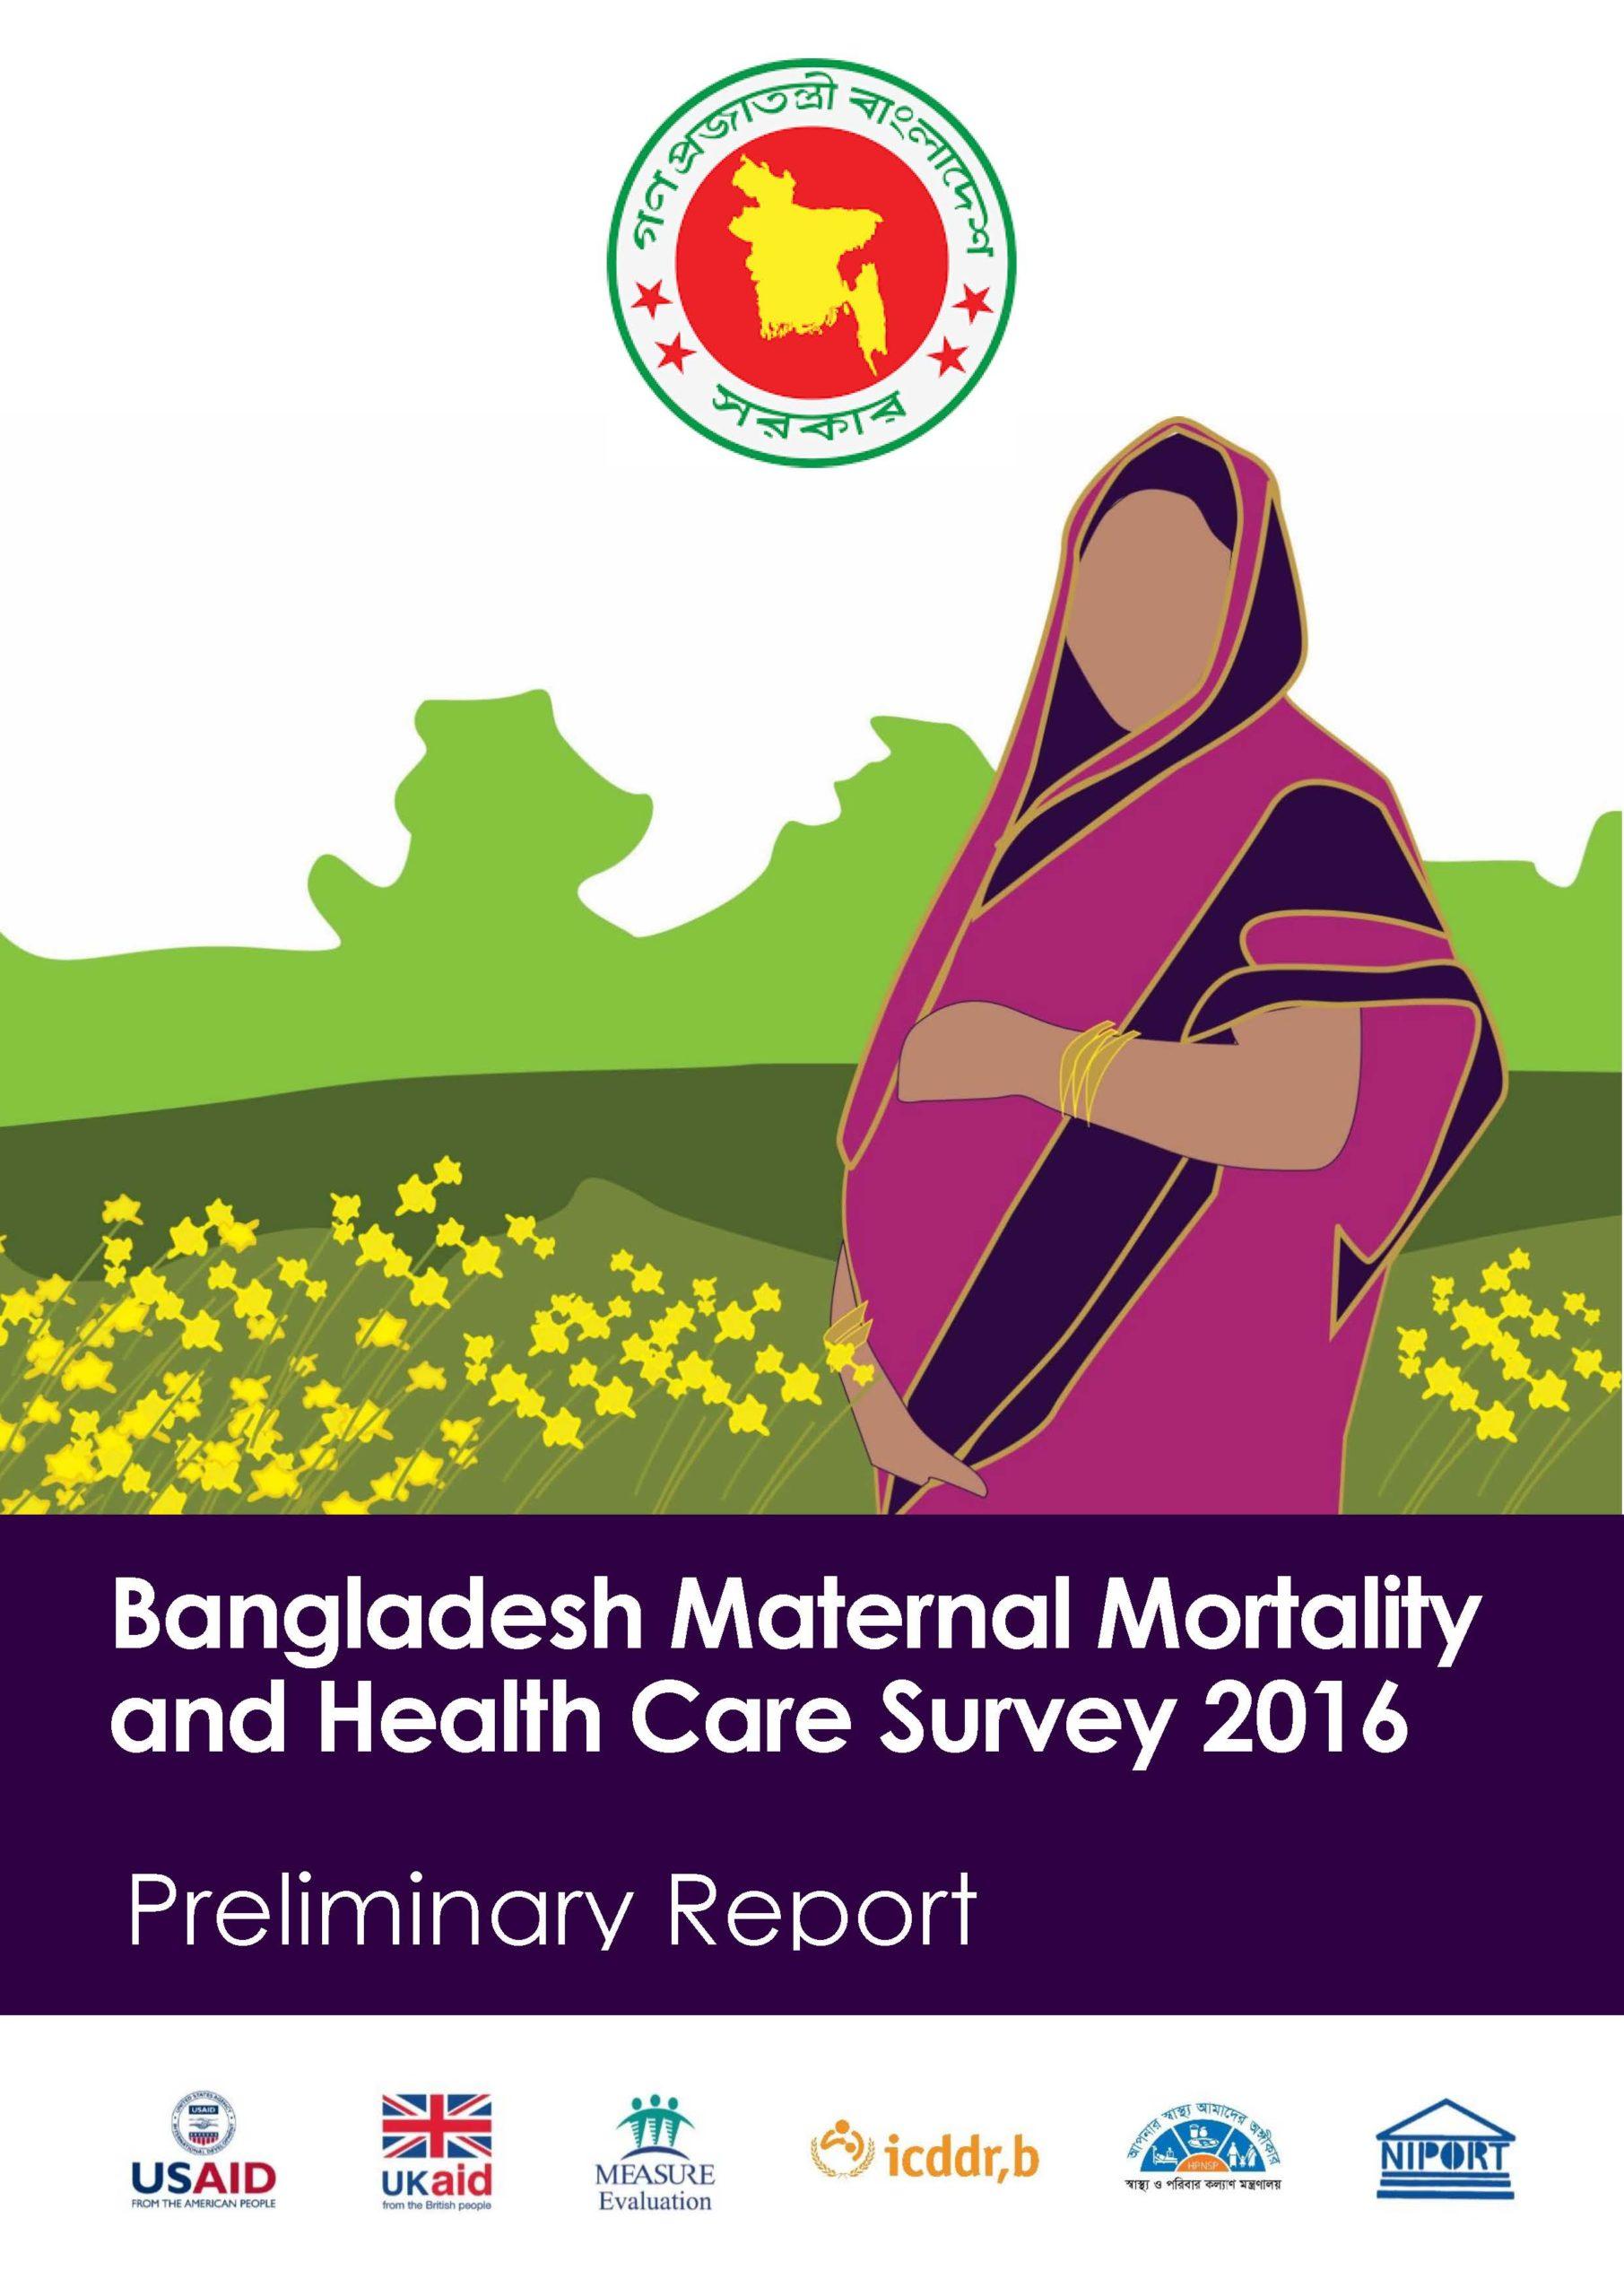 Bangladesh Maternal Mortality and Health Care Survey 2016: Preliminary Report